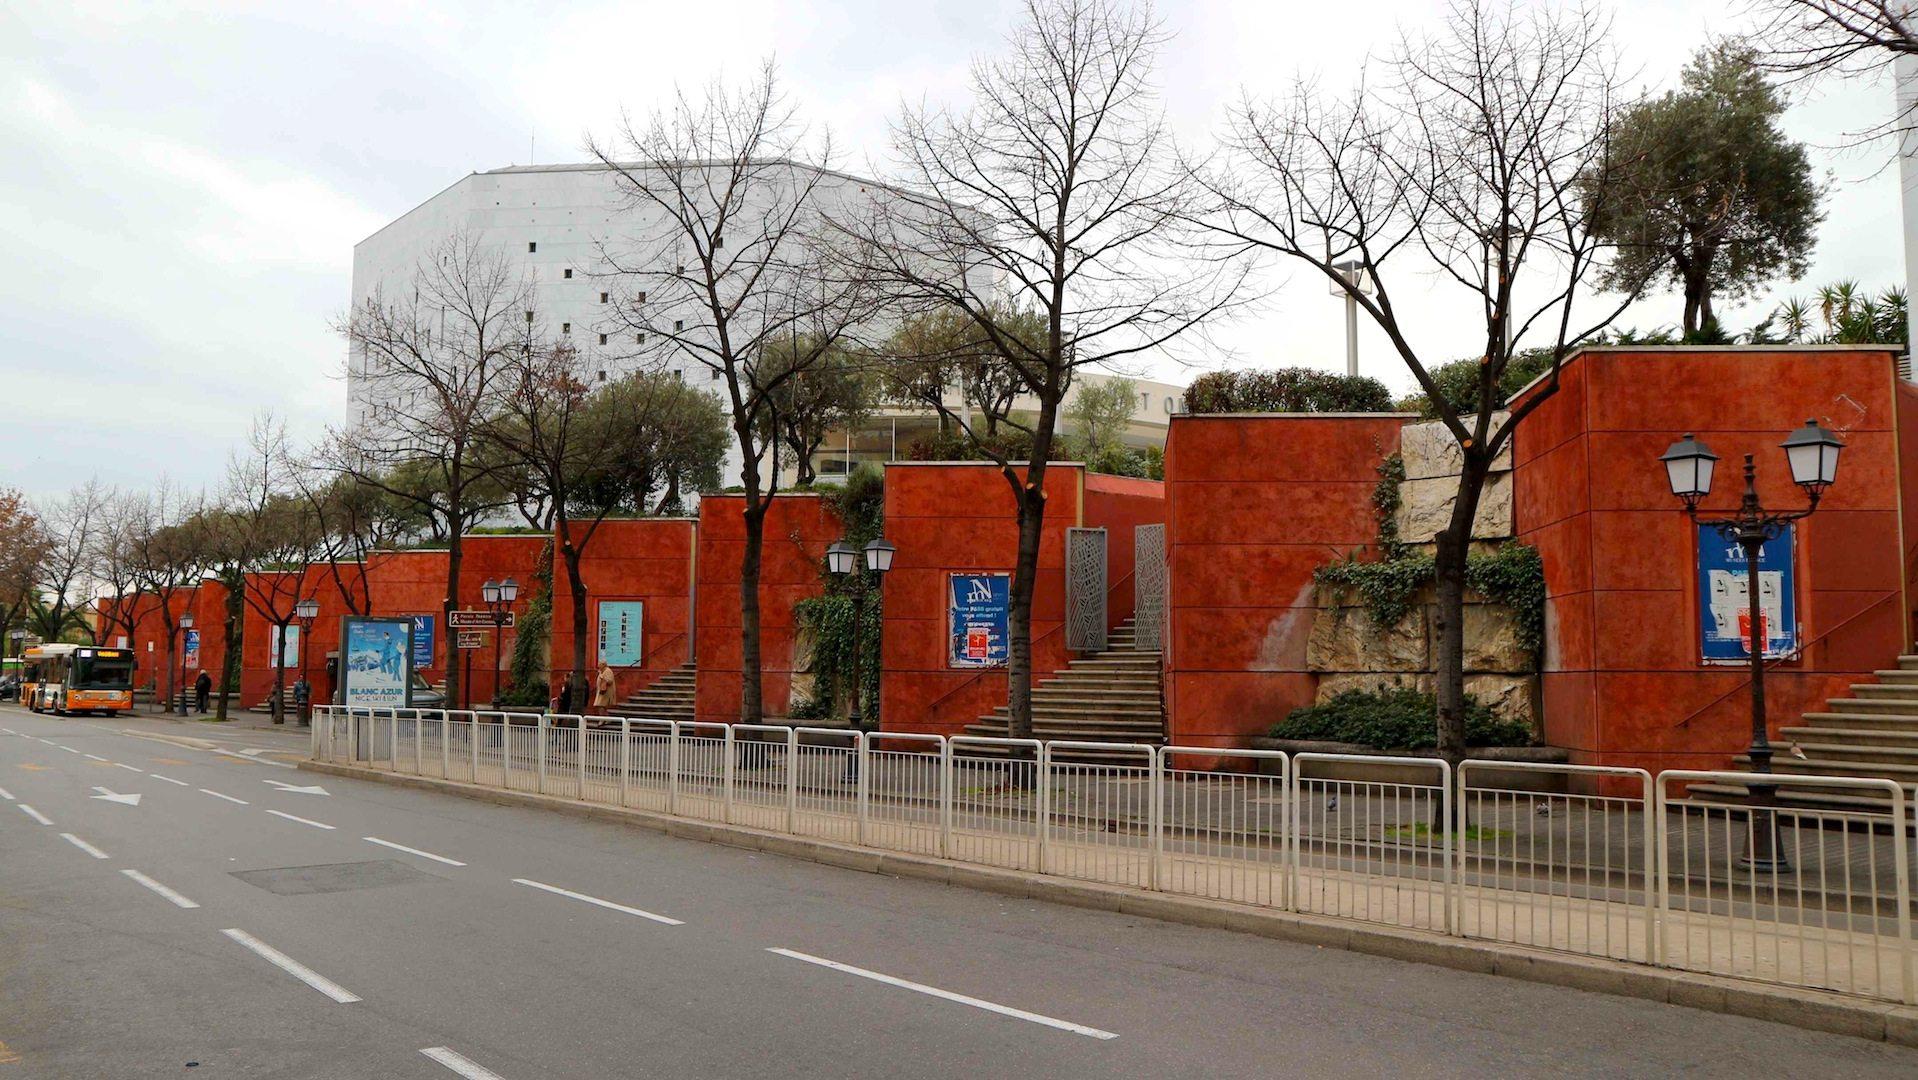 Théâtre National de Nice.  Architekt: Yves Bayard